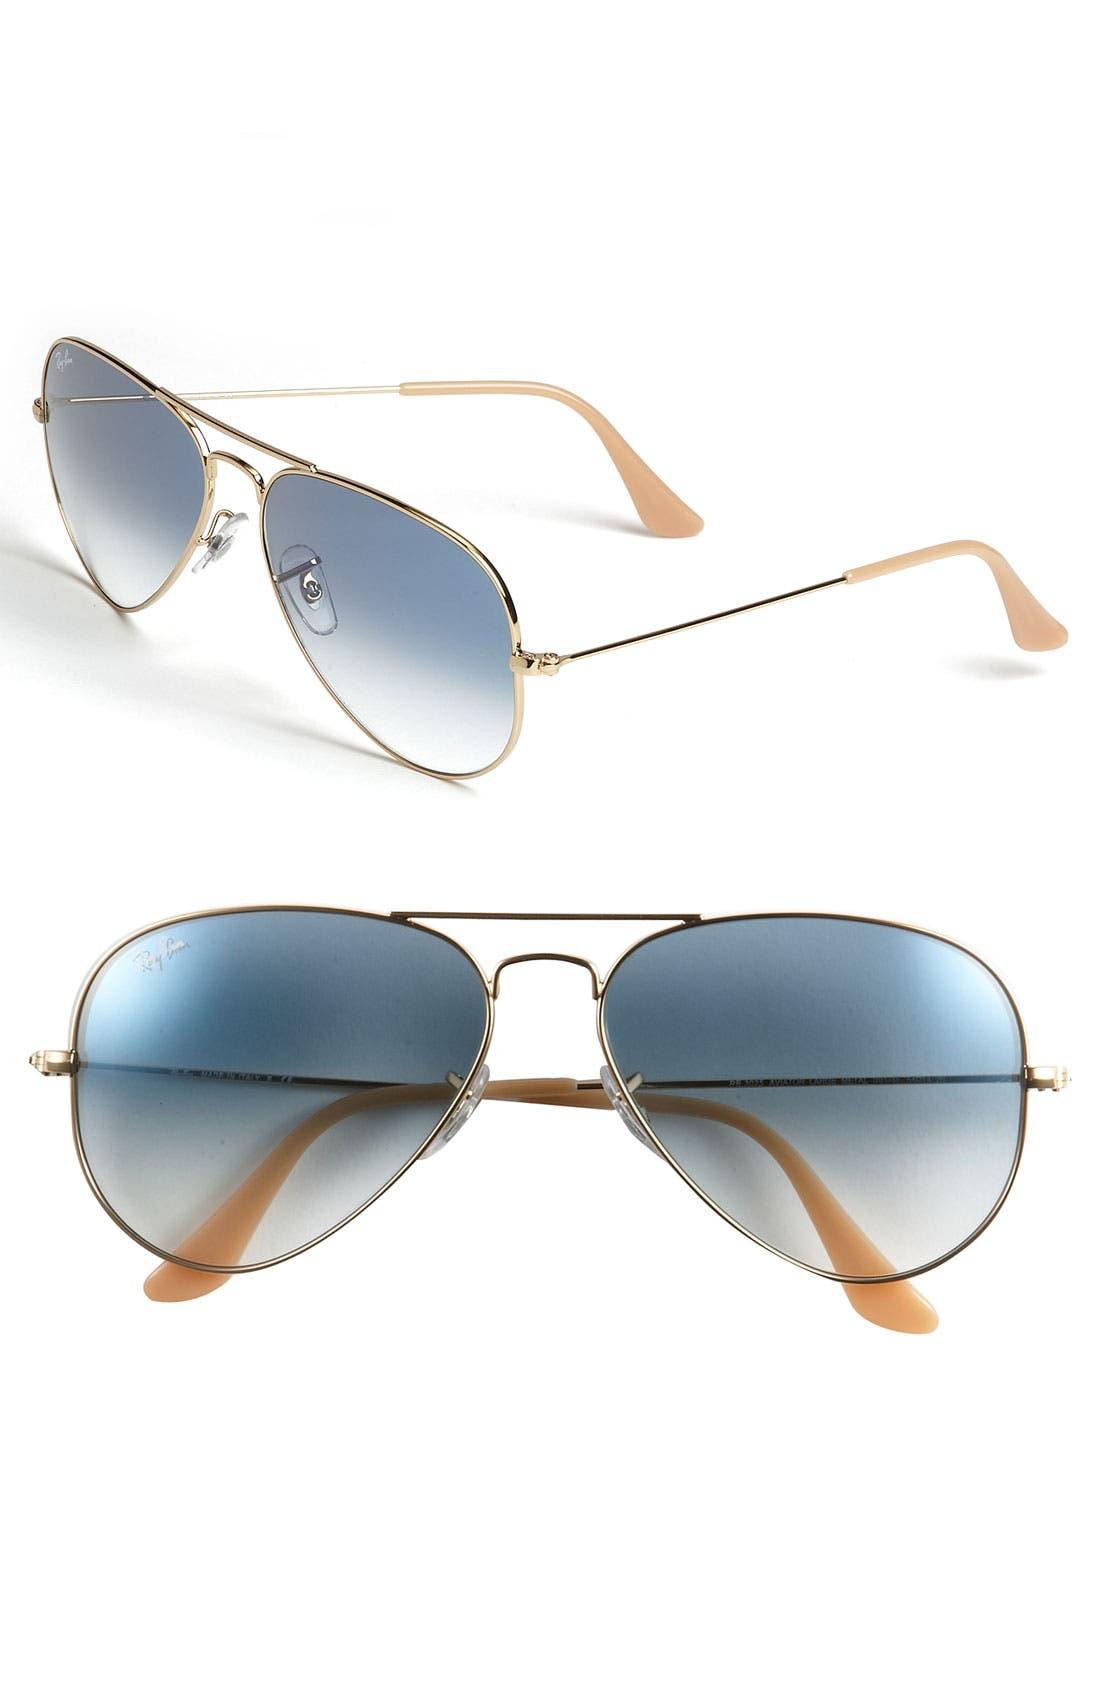 Ray-Ban Standard Original 5m Aviator Sunglasses - Gold/ Blue Gradient